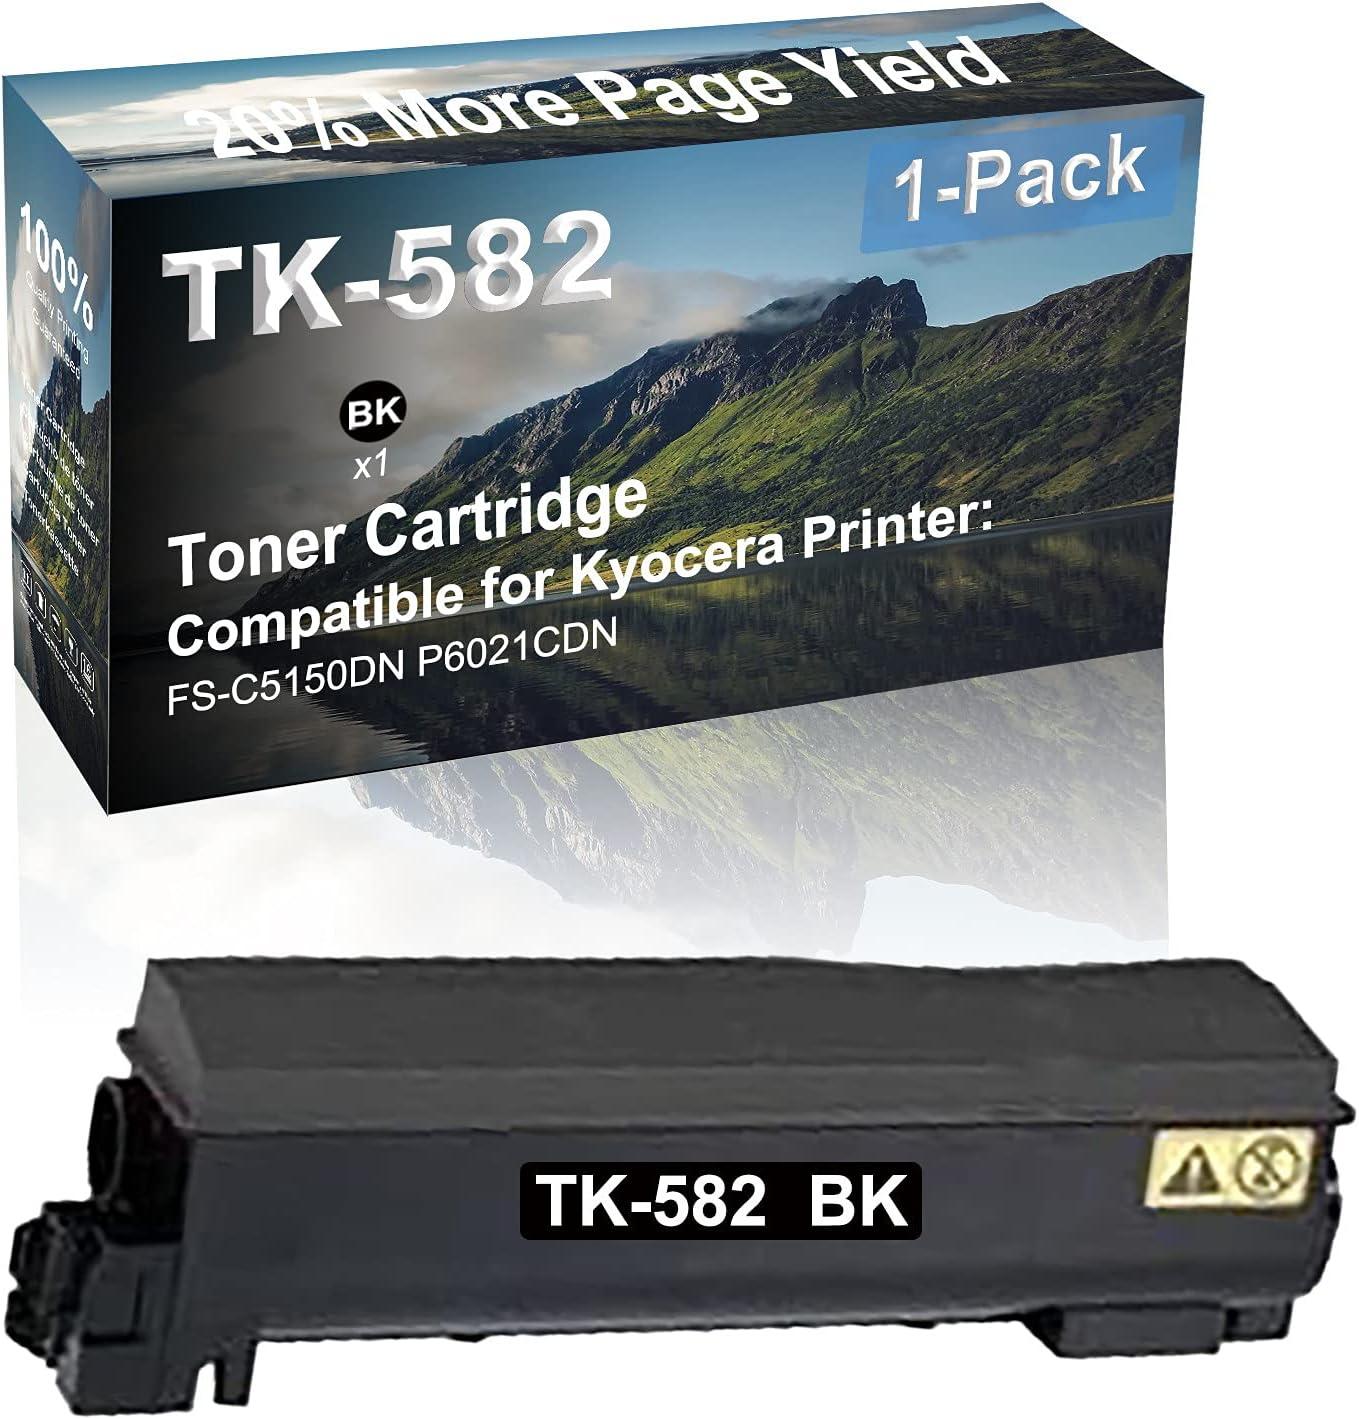 1-Pack (Black) Compatible FS-C5150DN P6021CDN Printer Toner Cartridge High Capacity Replacement for Kyocera (TK-582BK) TK582 Toner Cartridge